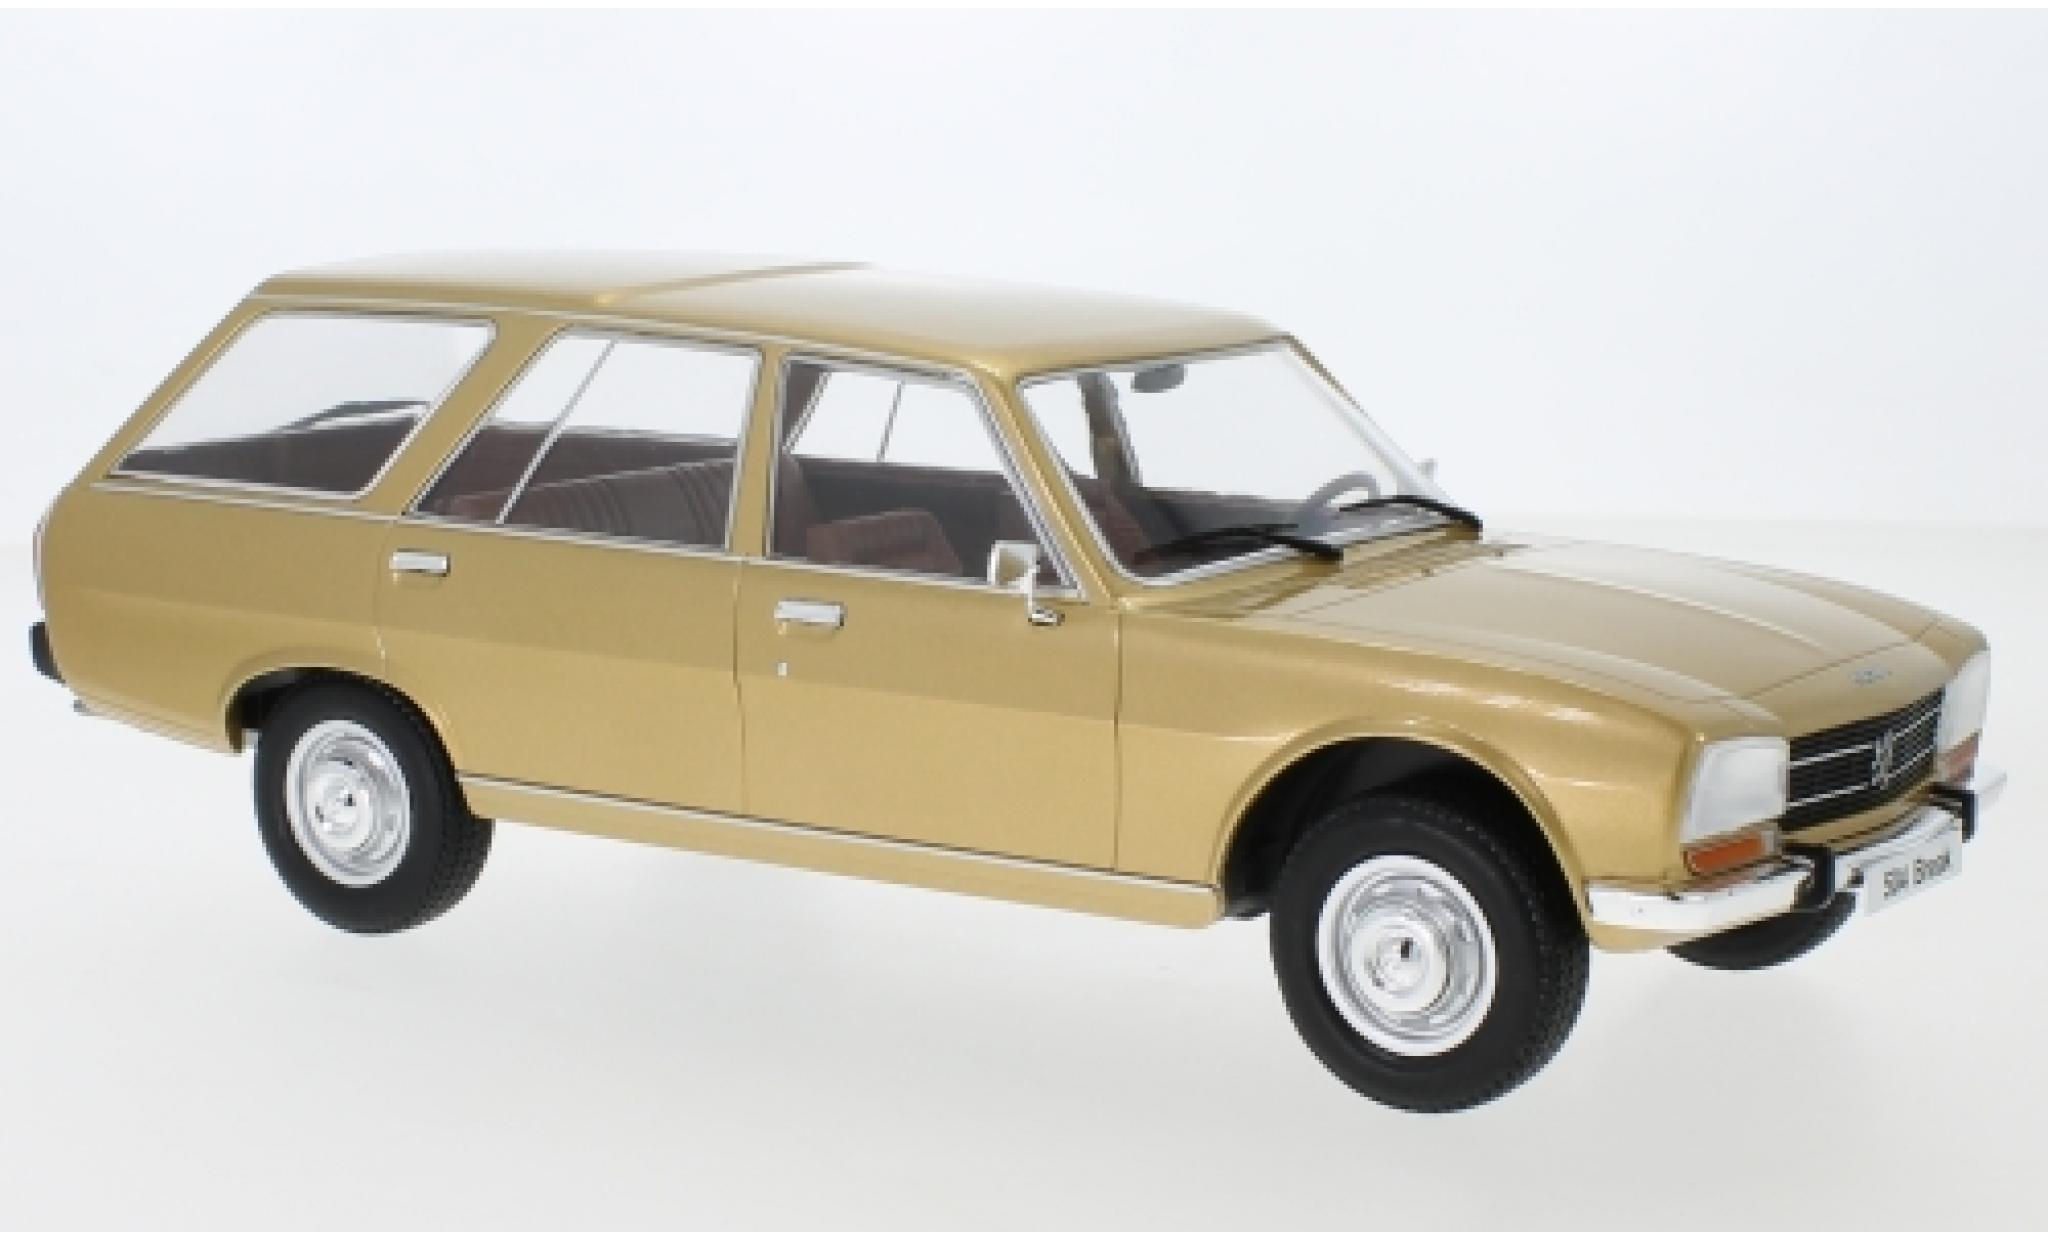 Peugeot 504 1/18 MCG Break gold 1976